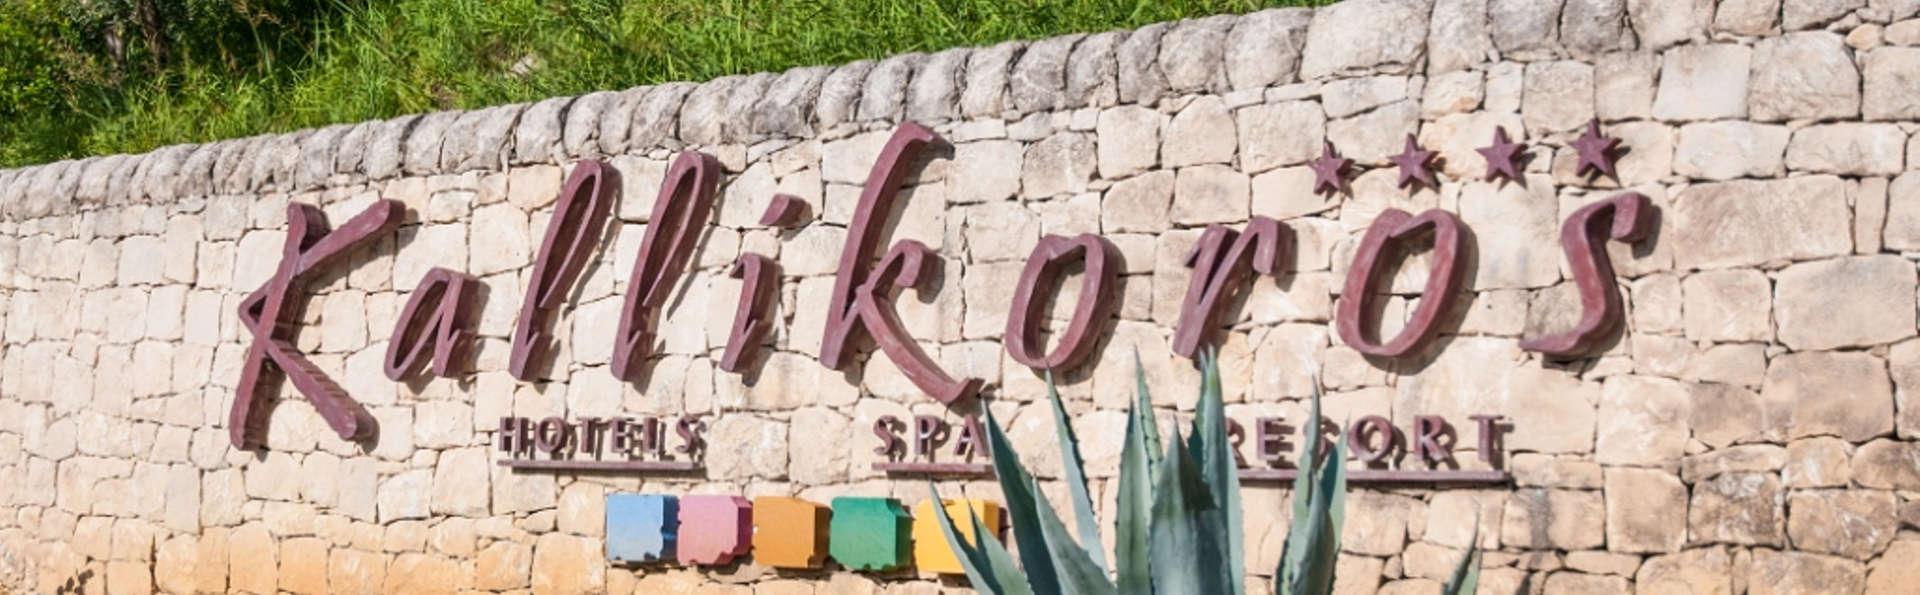 Kallikoros Country Resort & Spa - Edit_Front3.jpg